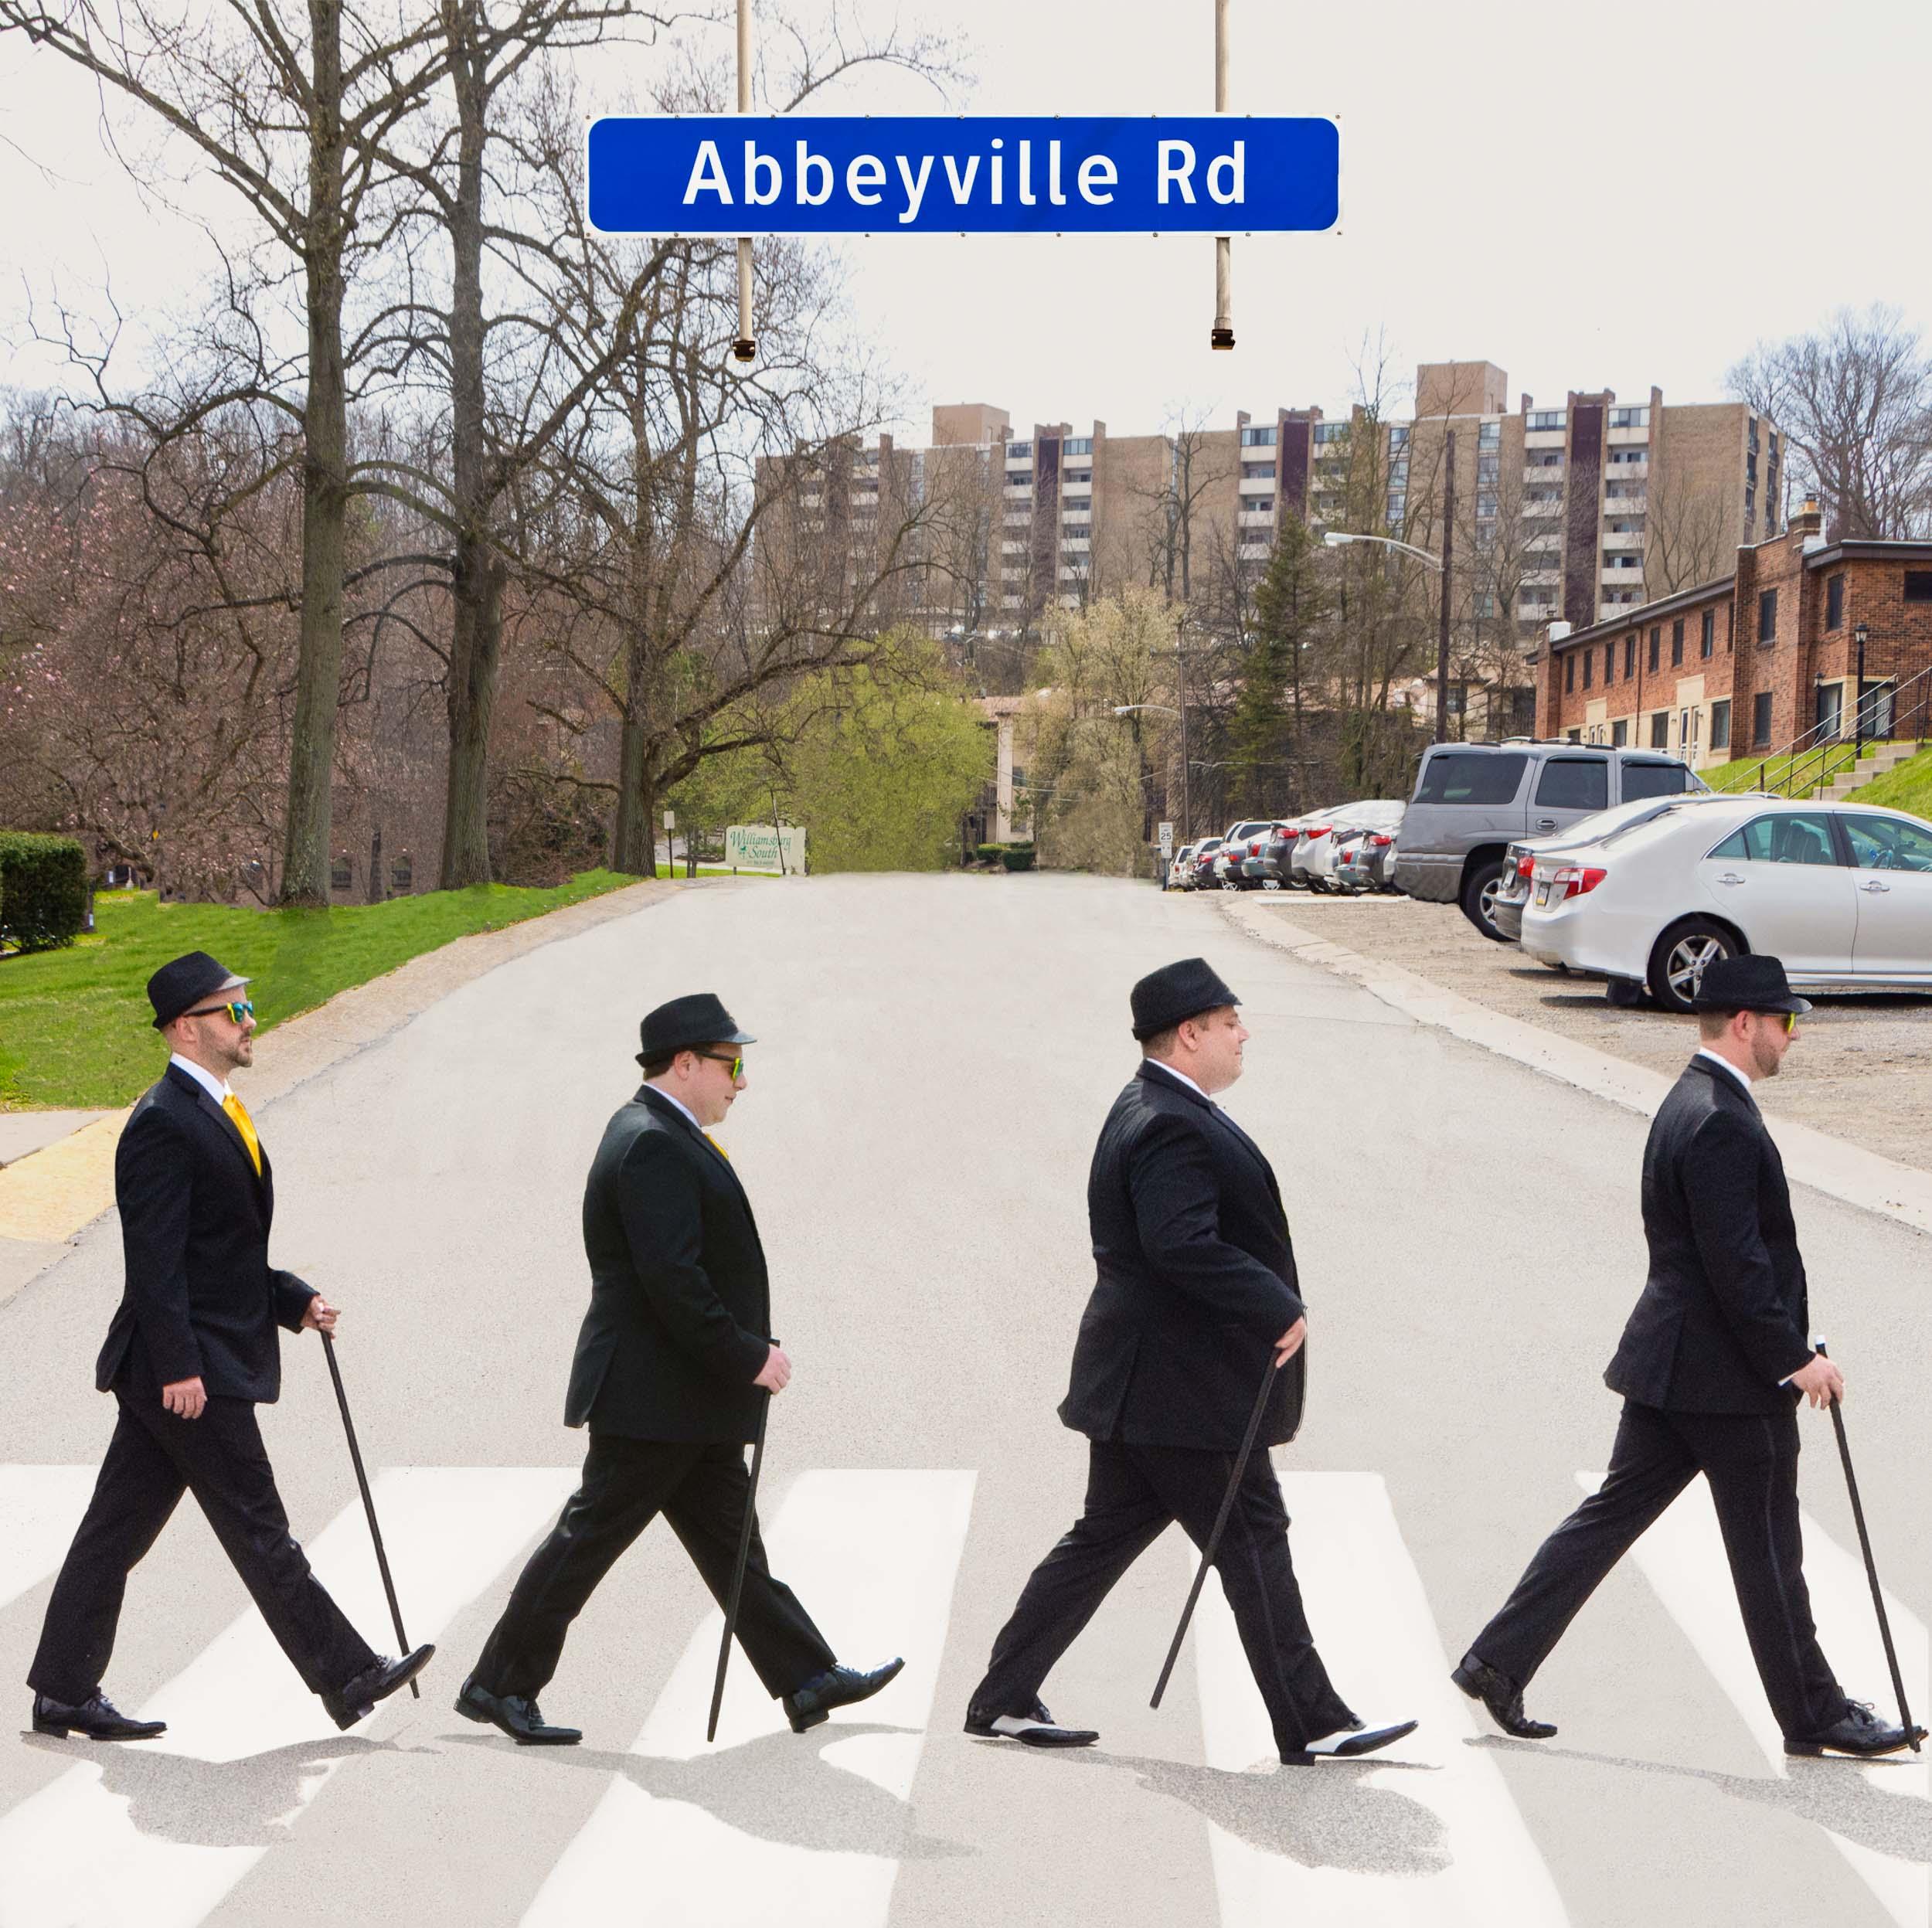 Groom-Groomsmen-Abby-Road-Cover-1.jpg